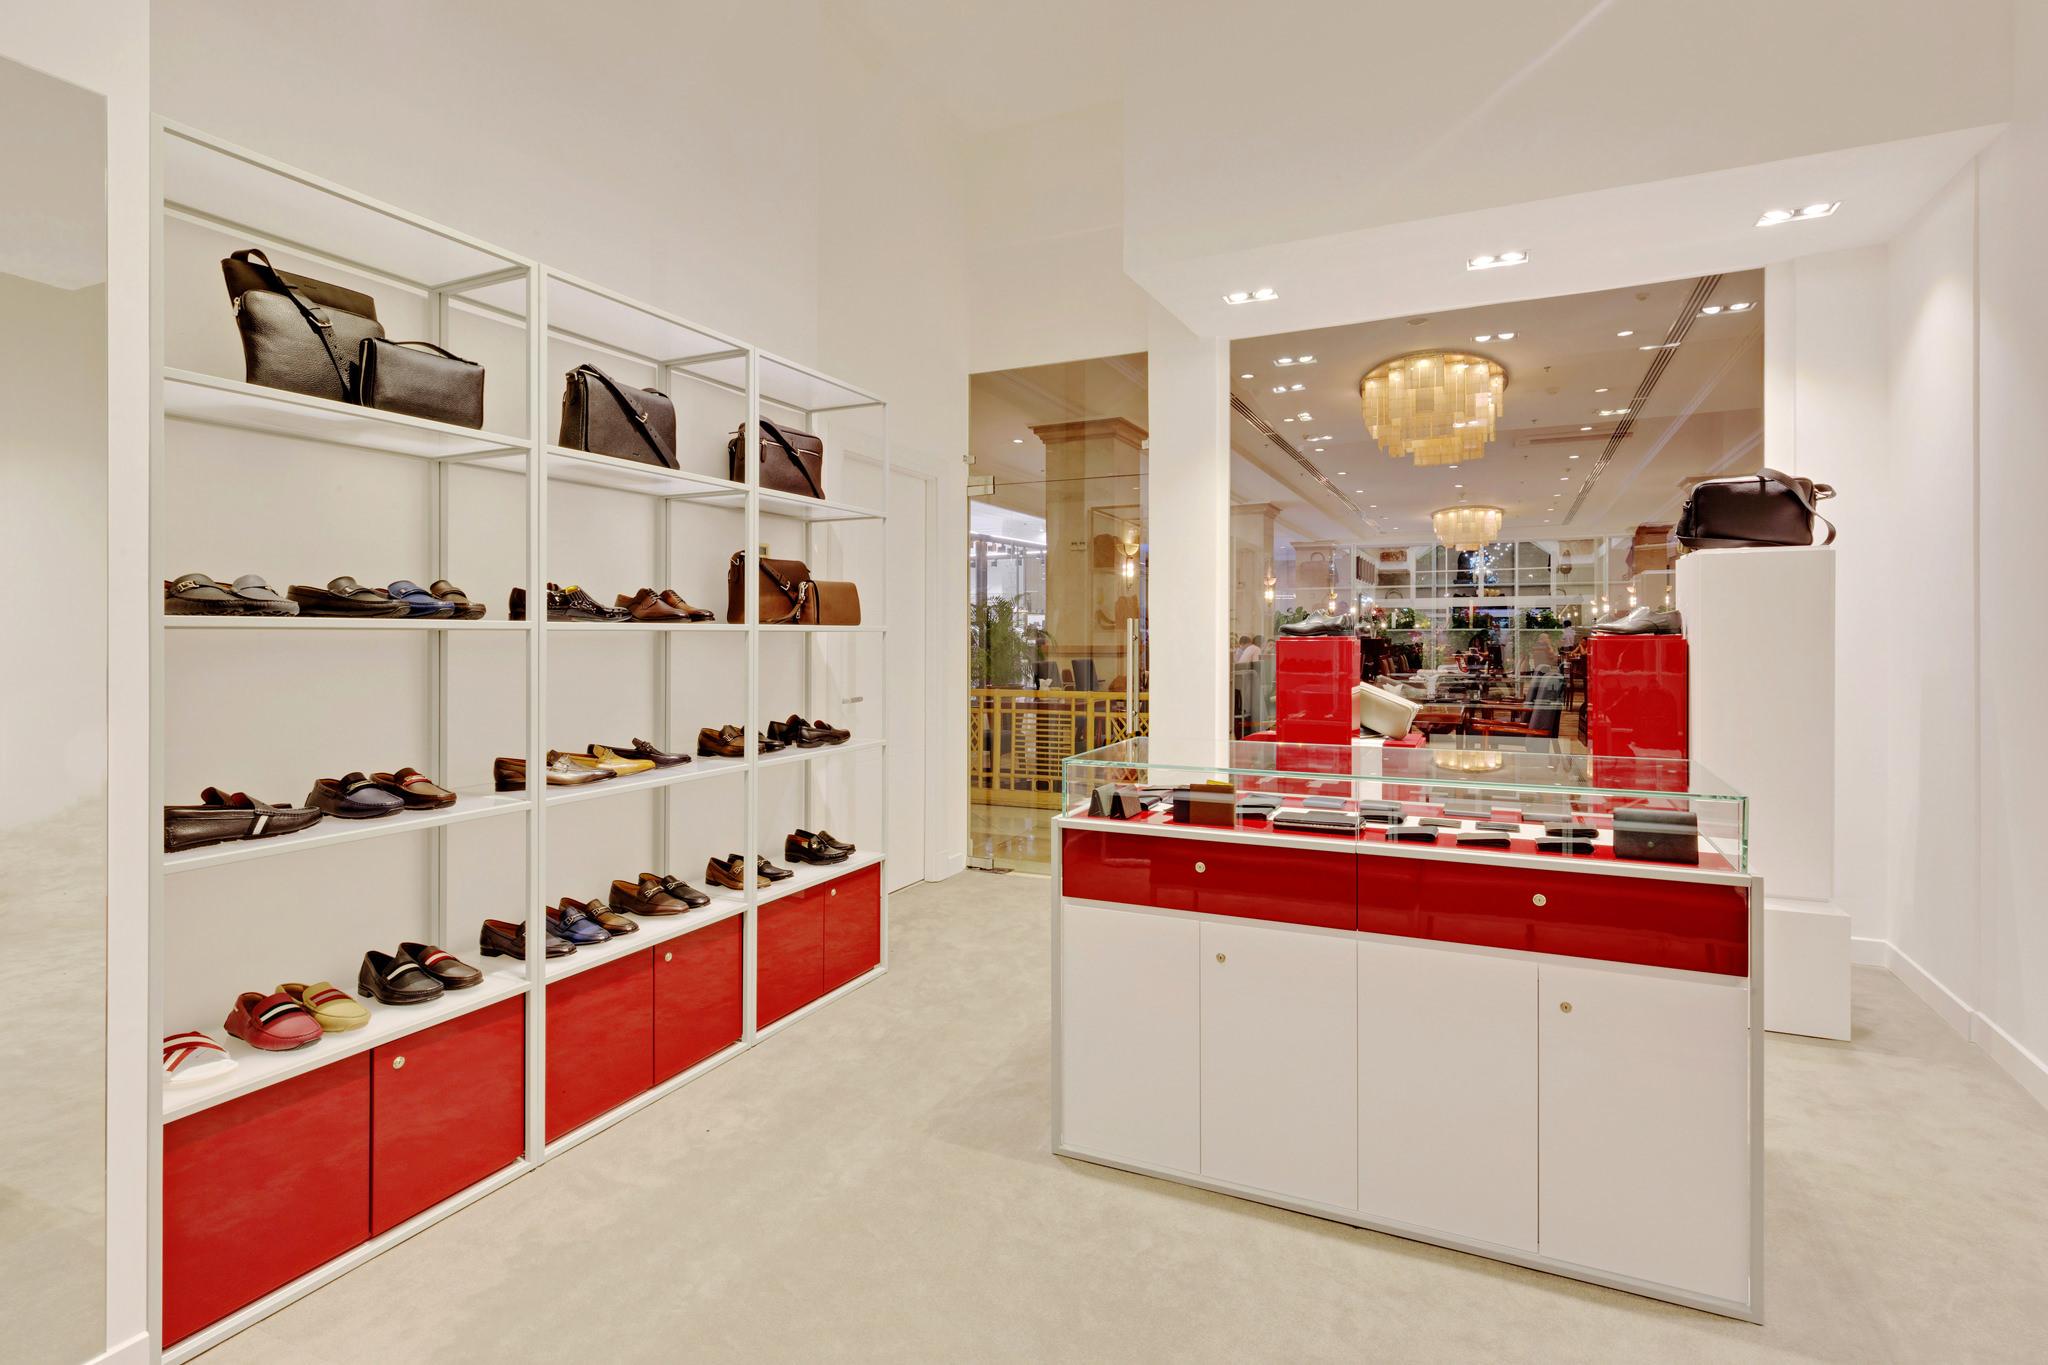 20170316 - Bally - HCM - Commercial - Interior - Store - Retouch 0011.jpg